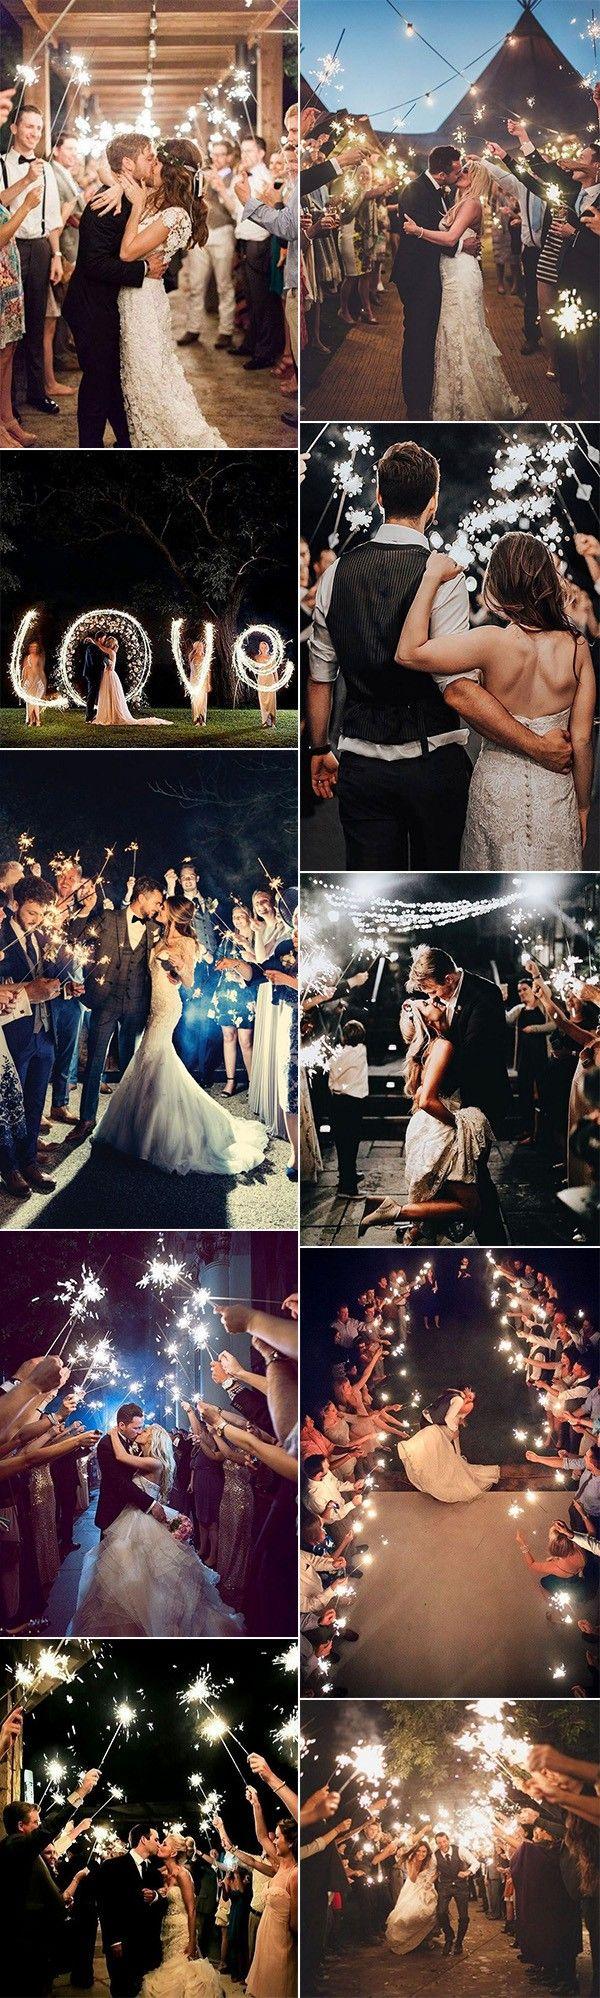 80s wedding decorations november 2018  best Art I love images on Pinterest  Dream wedding Wedding